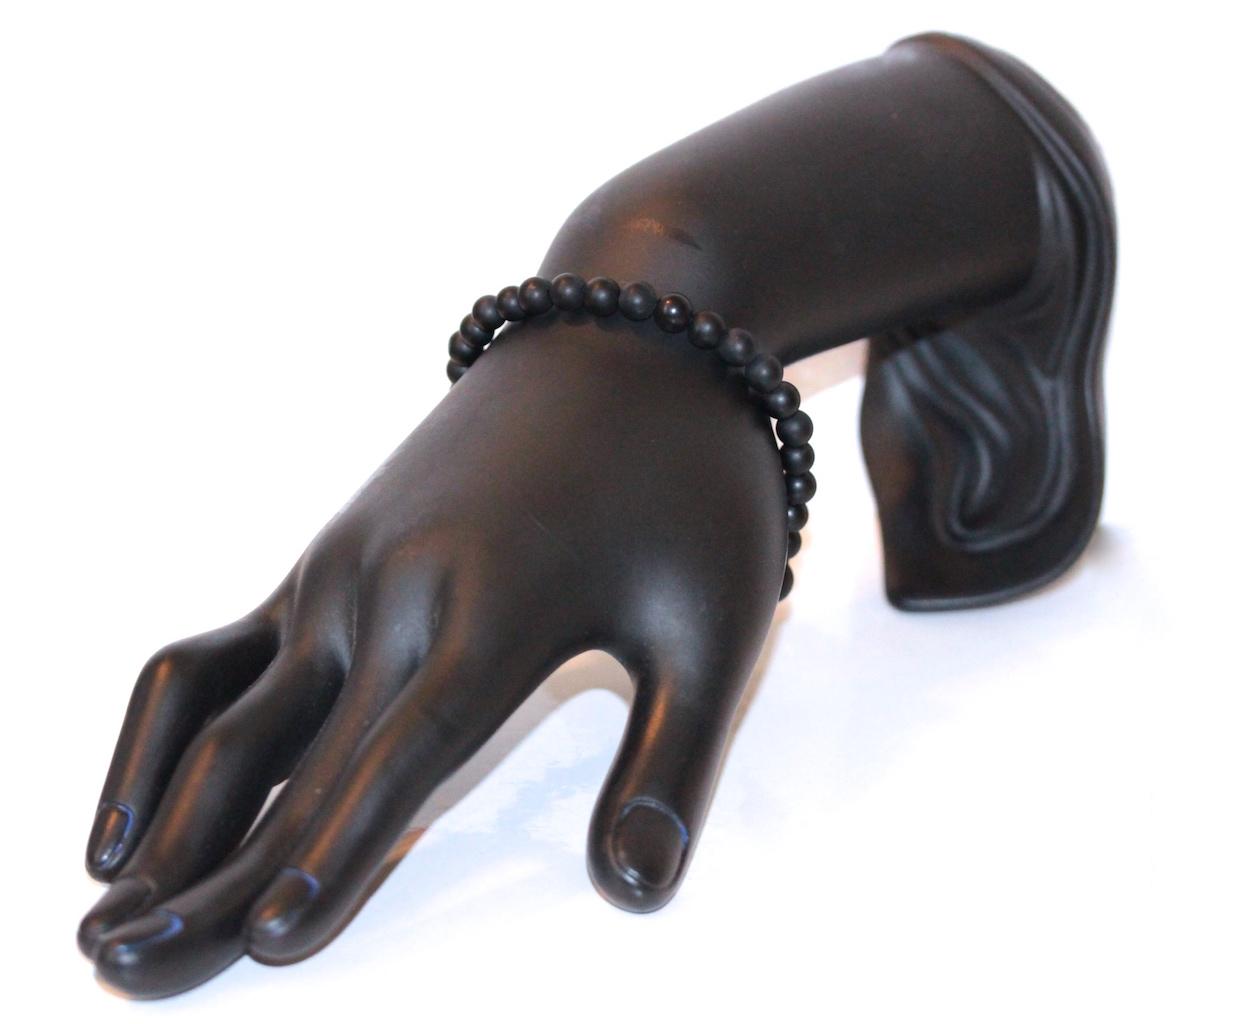 Discretion bracelet from JAWERY Paris